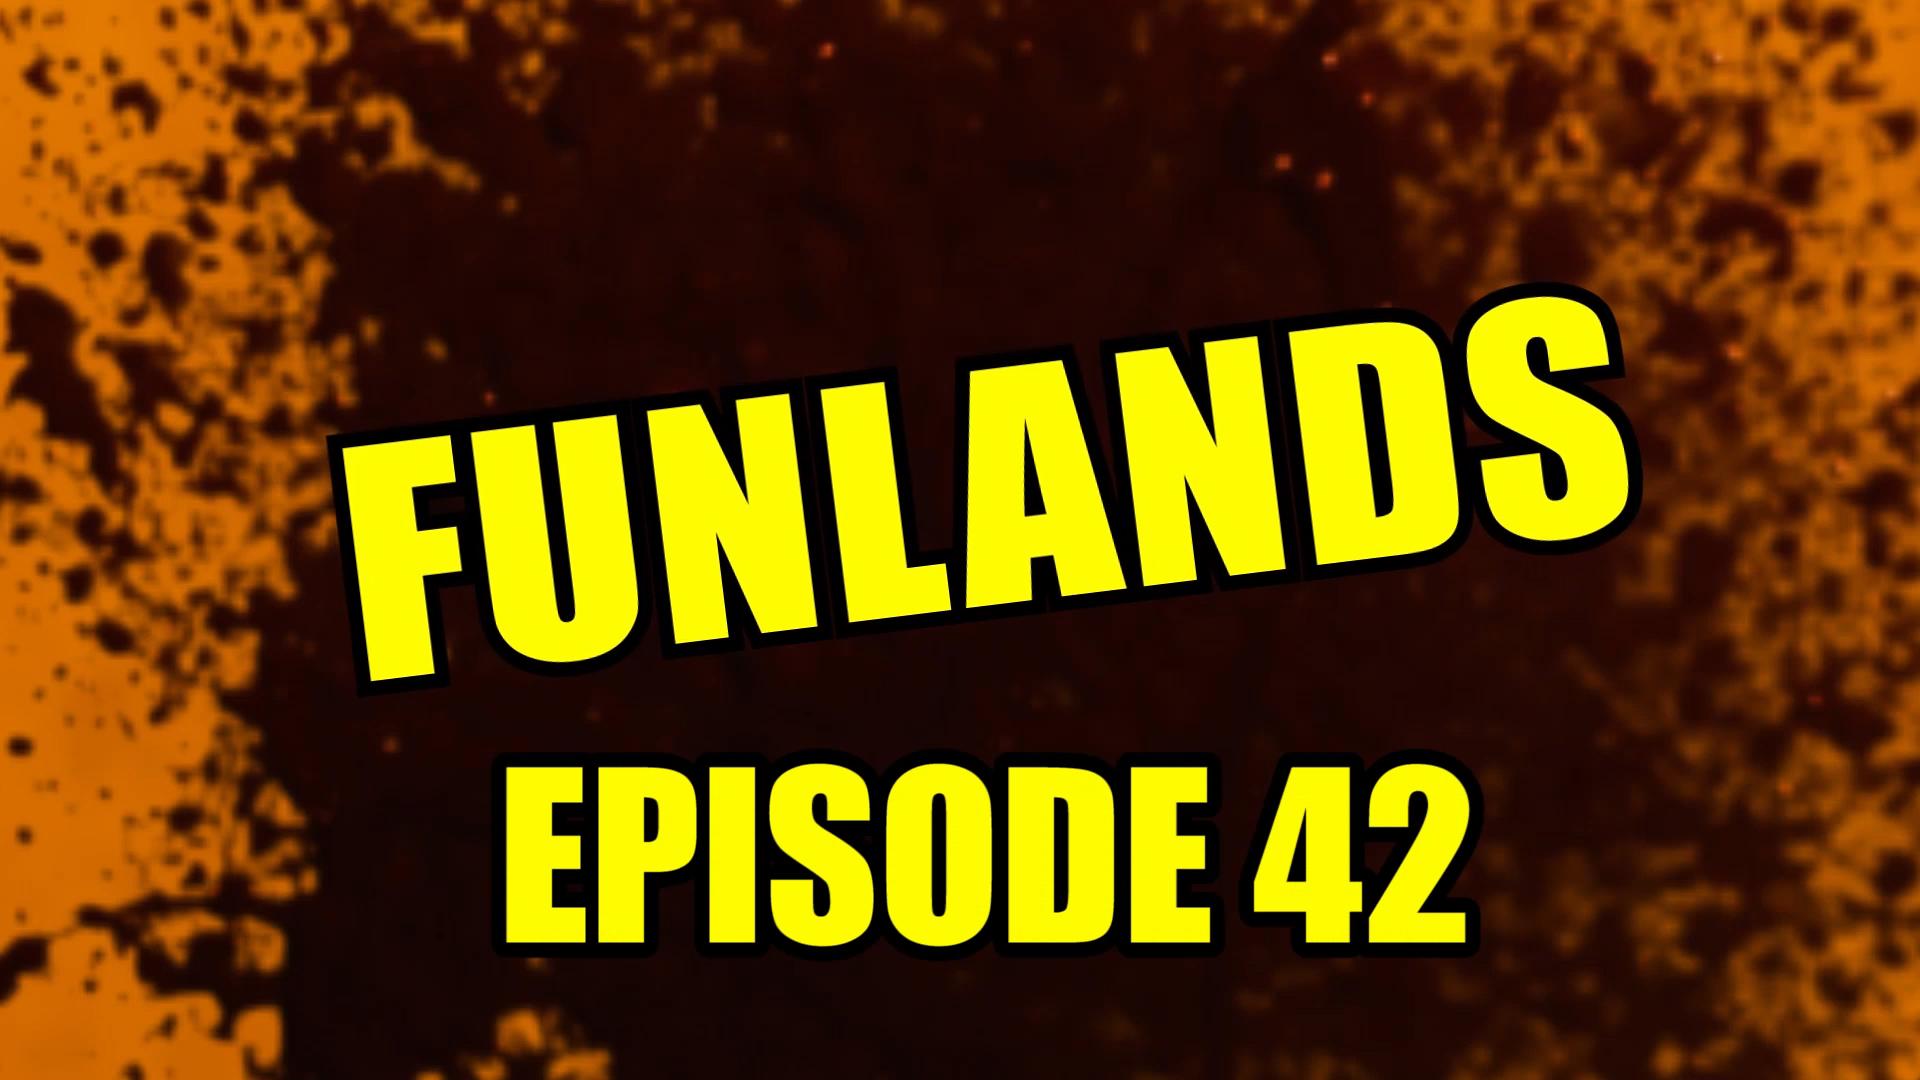 Funlands Episode 42.jpg